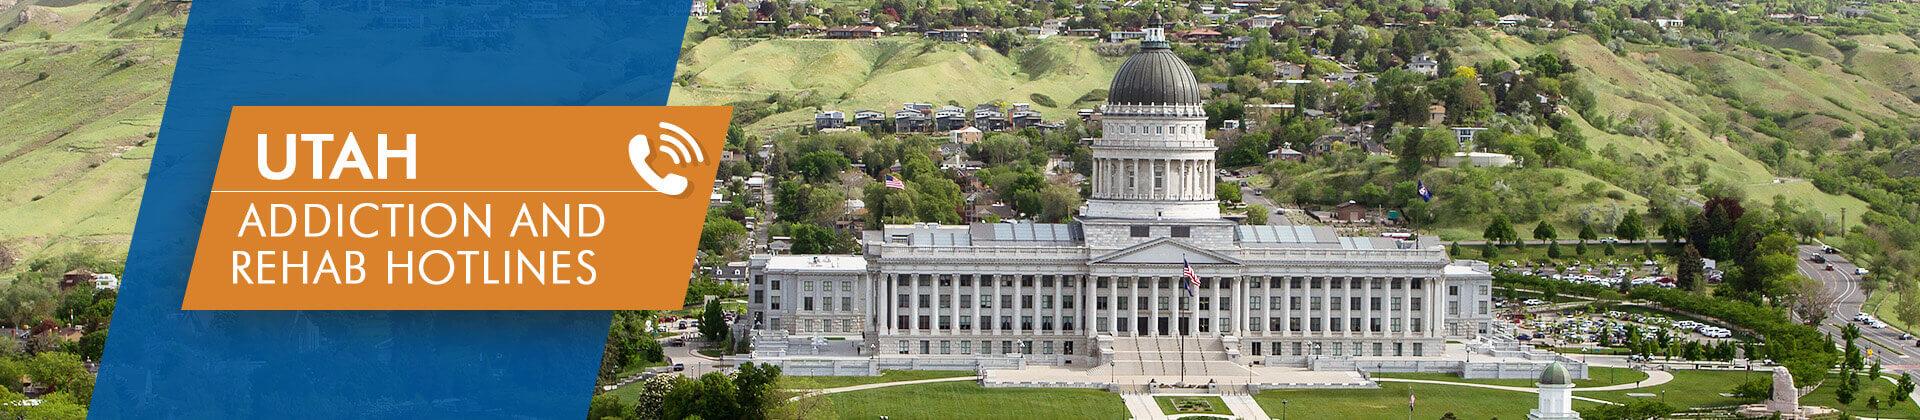 Utah addiction and rehab hotlines